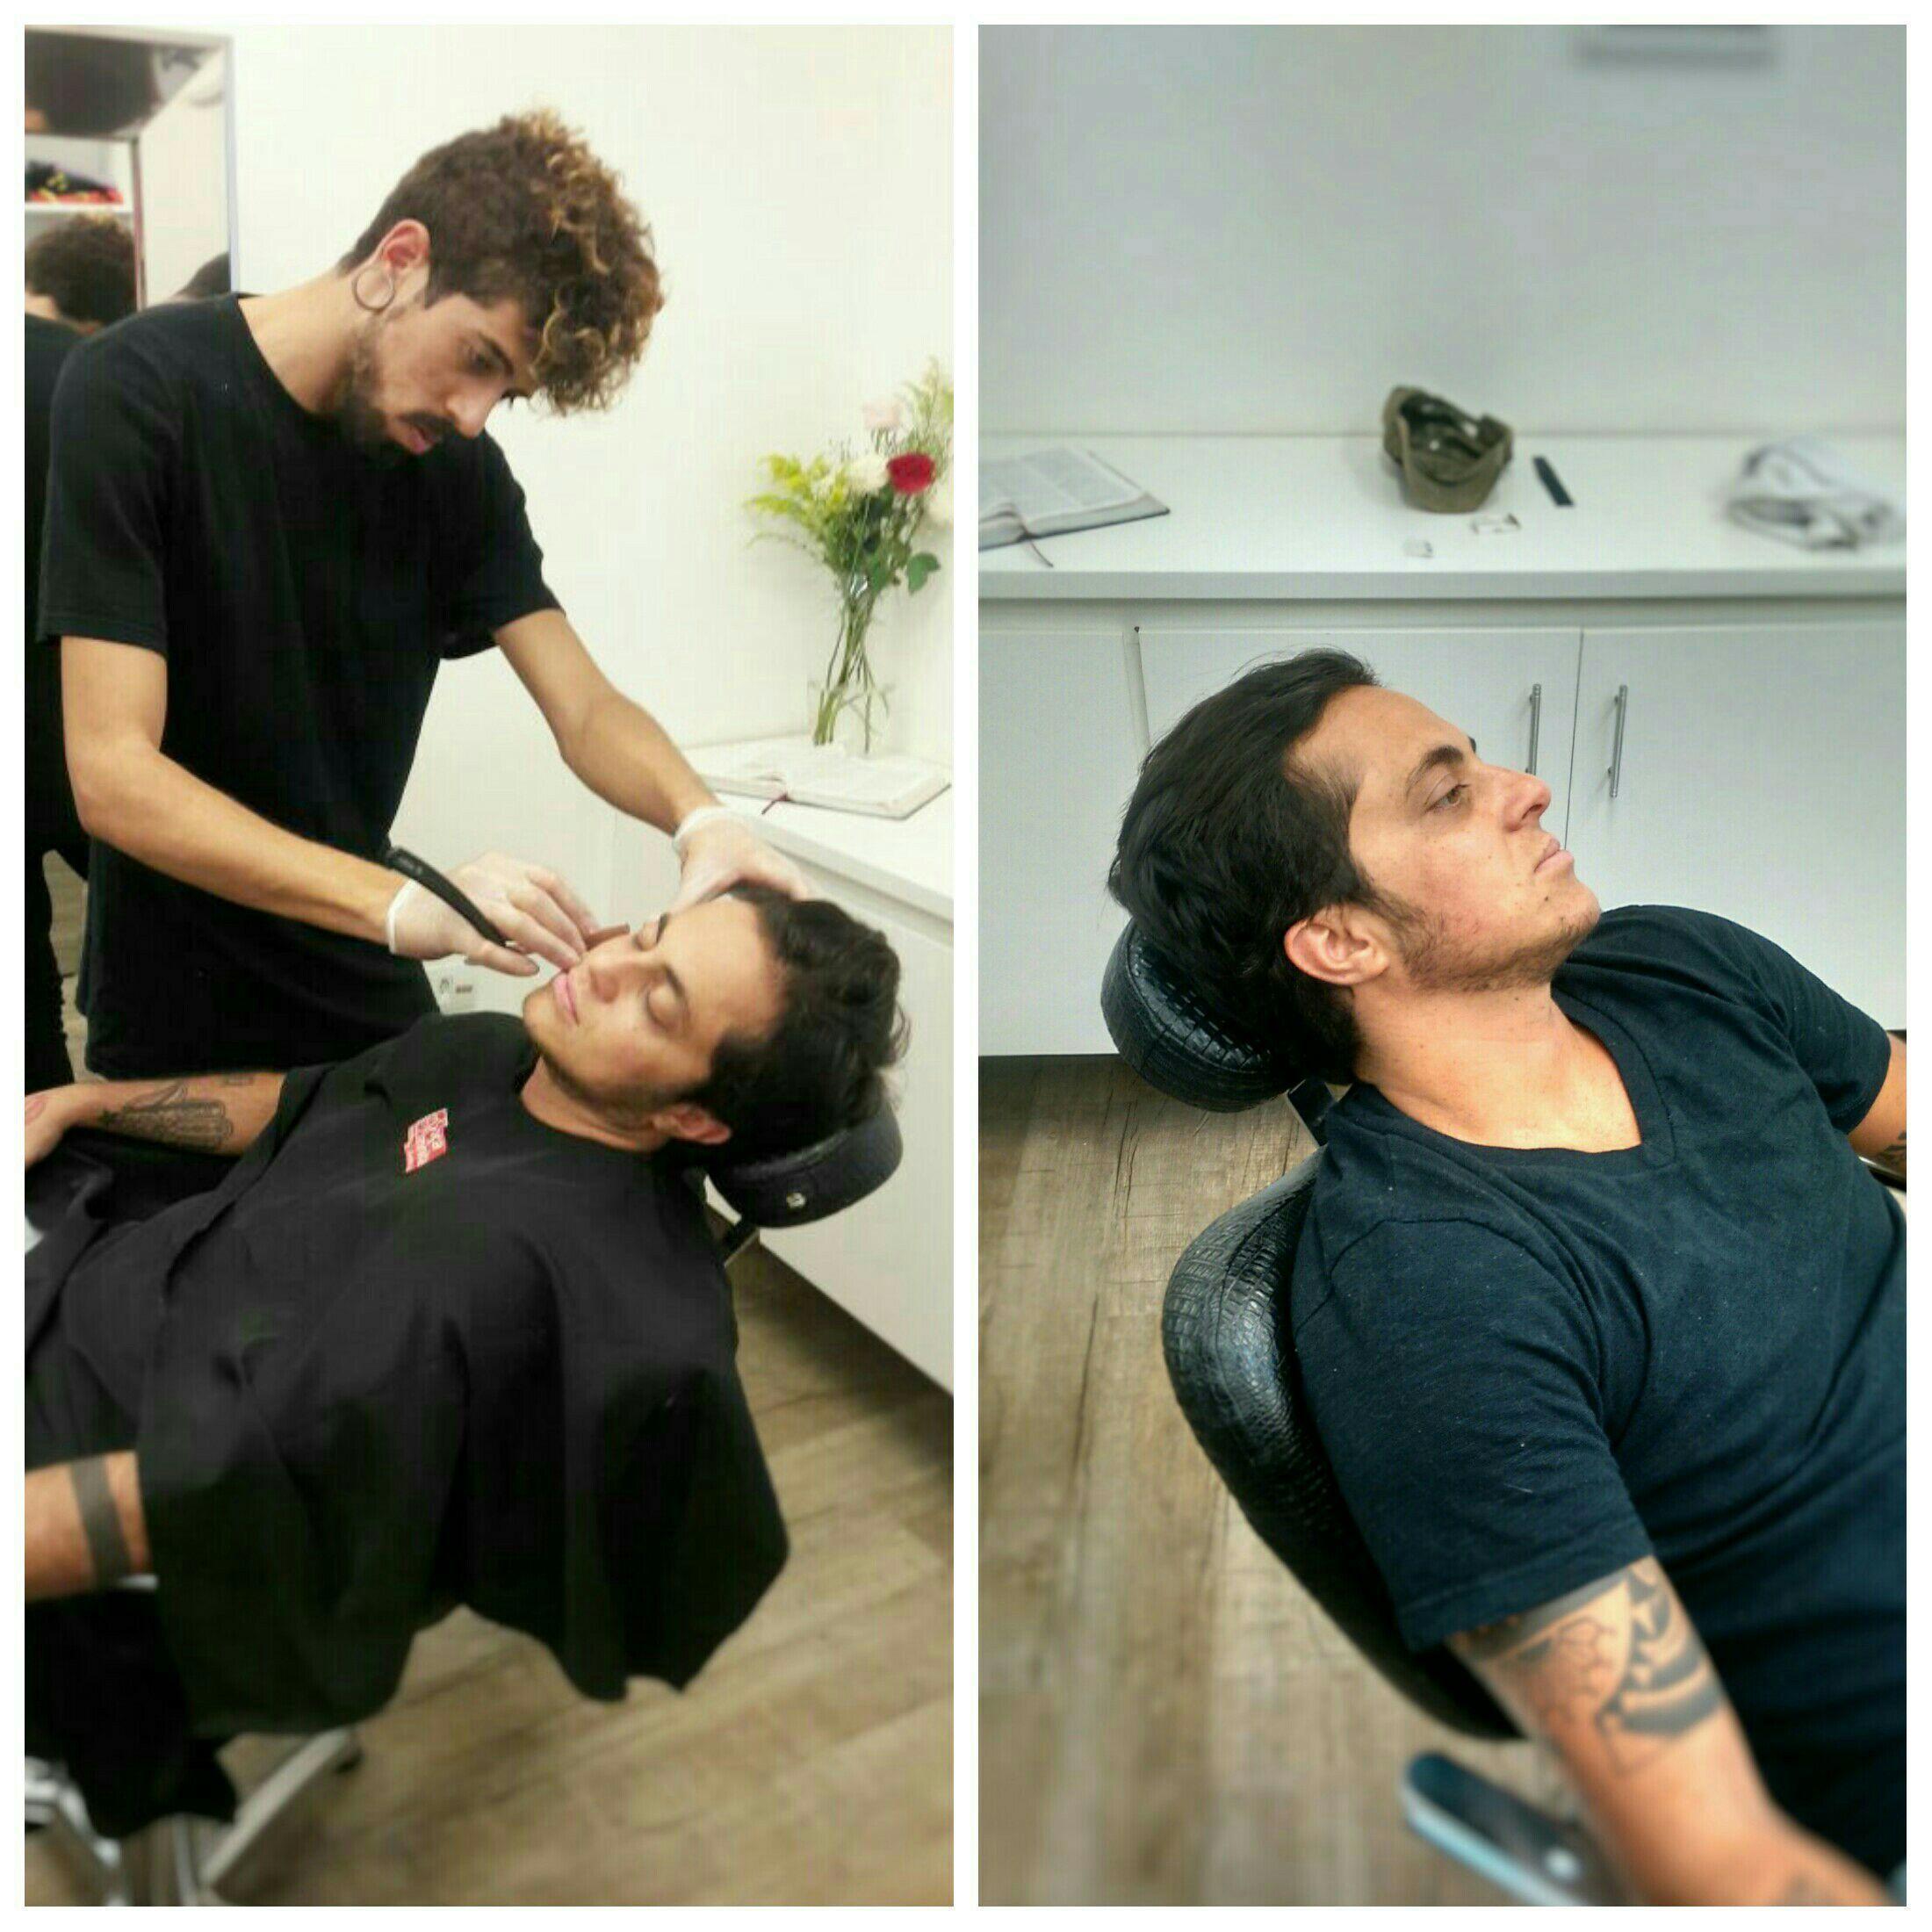 #Barber #ThamyMiranda outros estudante (visagista) cabeleireiro(a)